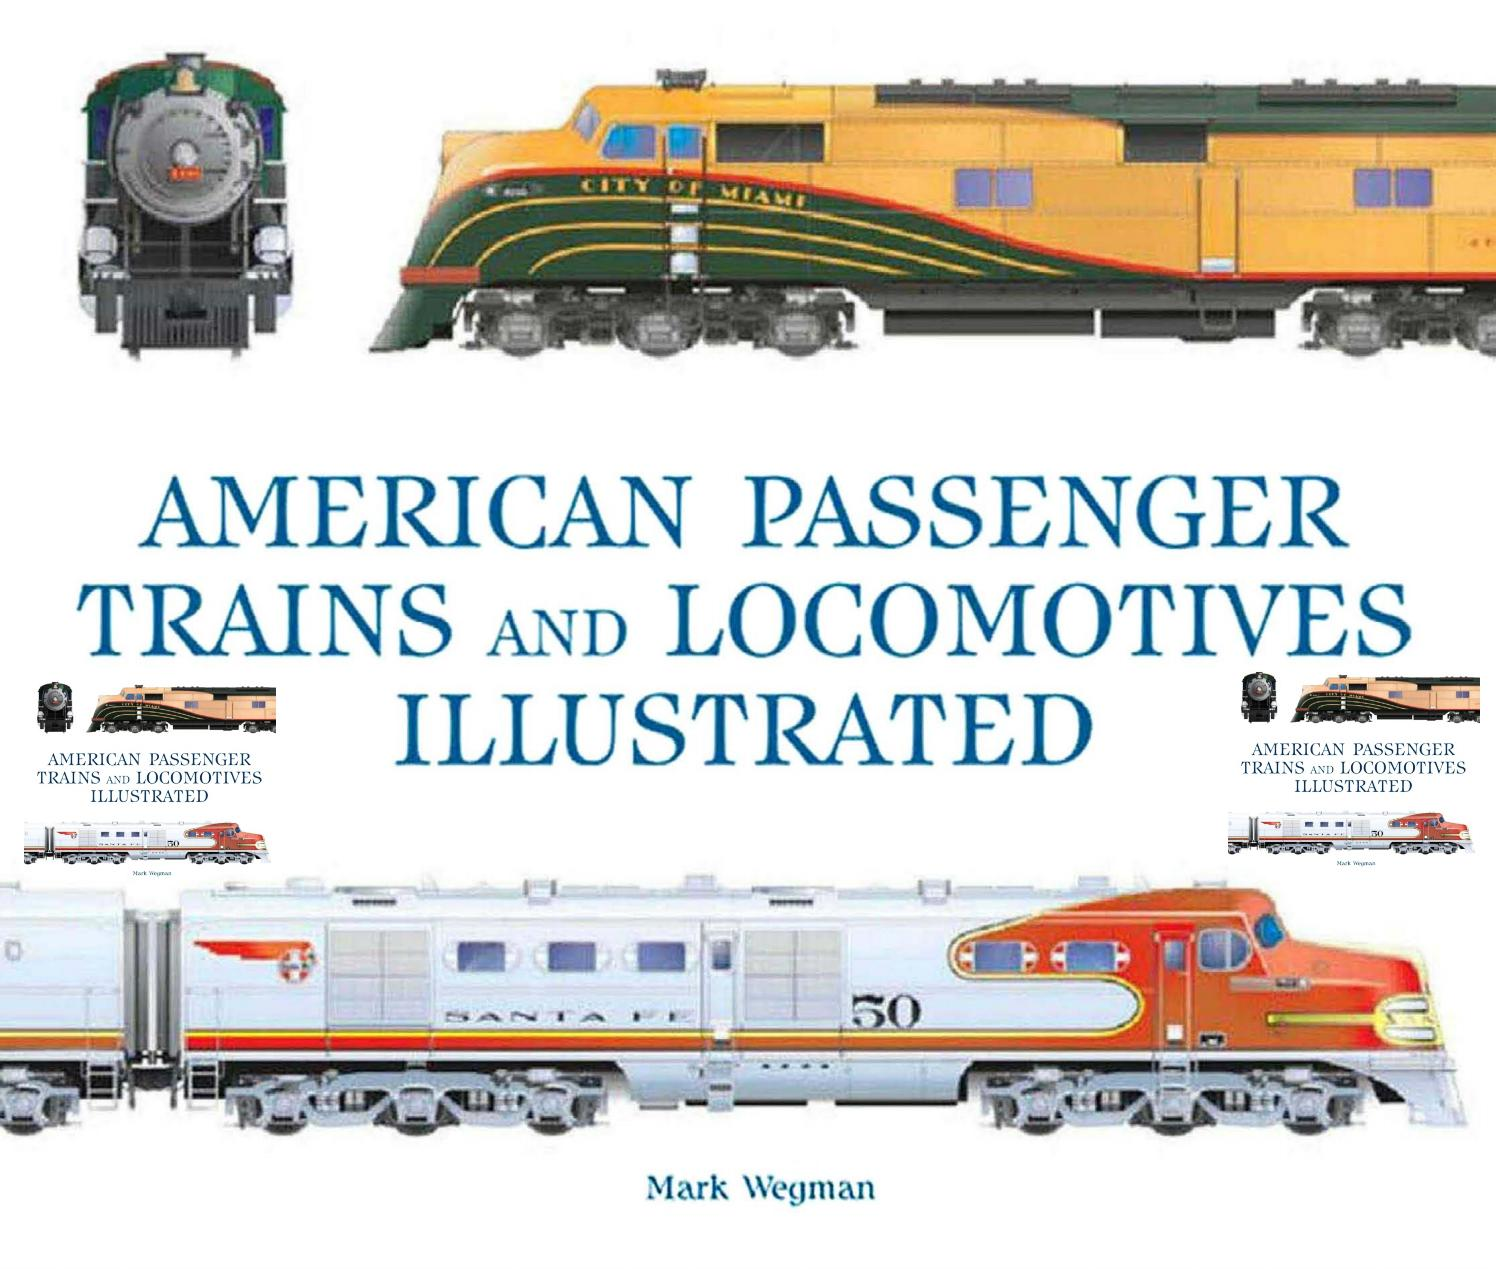 American passenger trains and locomotives (us railways